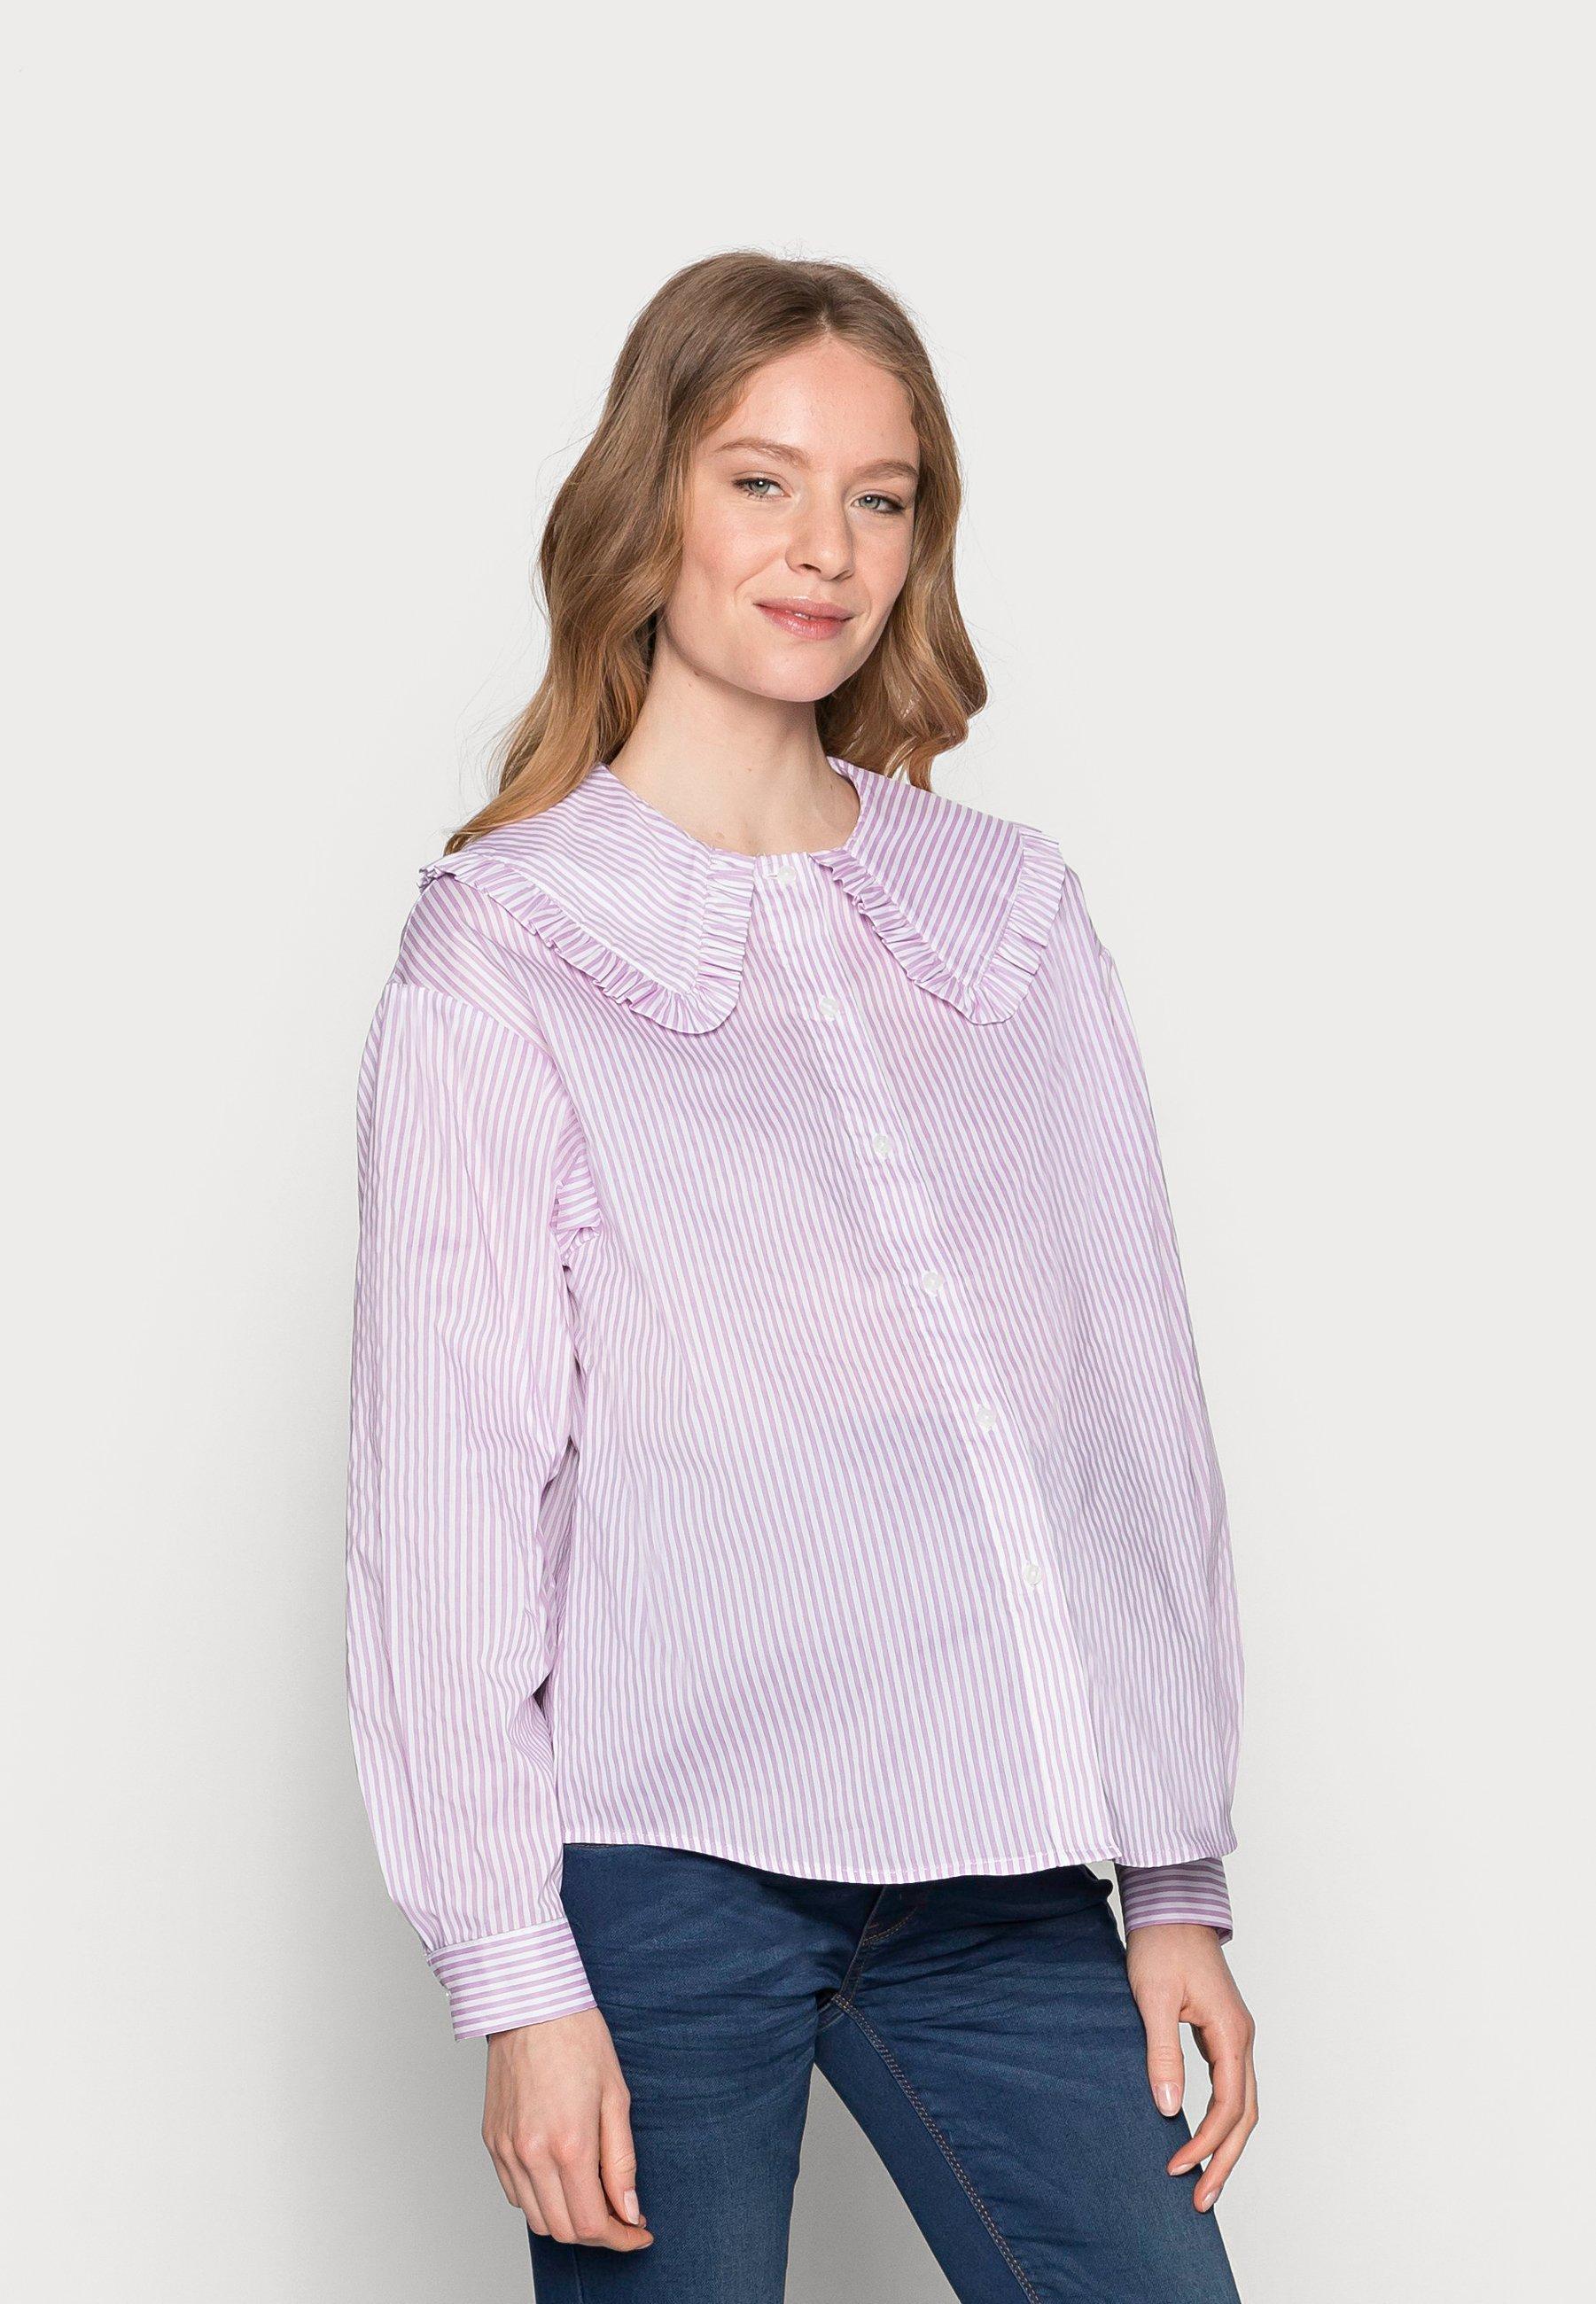 Women PCMHUNDA - Button-down blouse - bright white/orchid